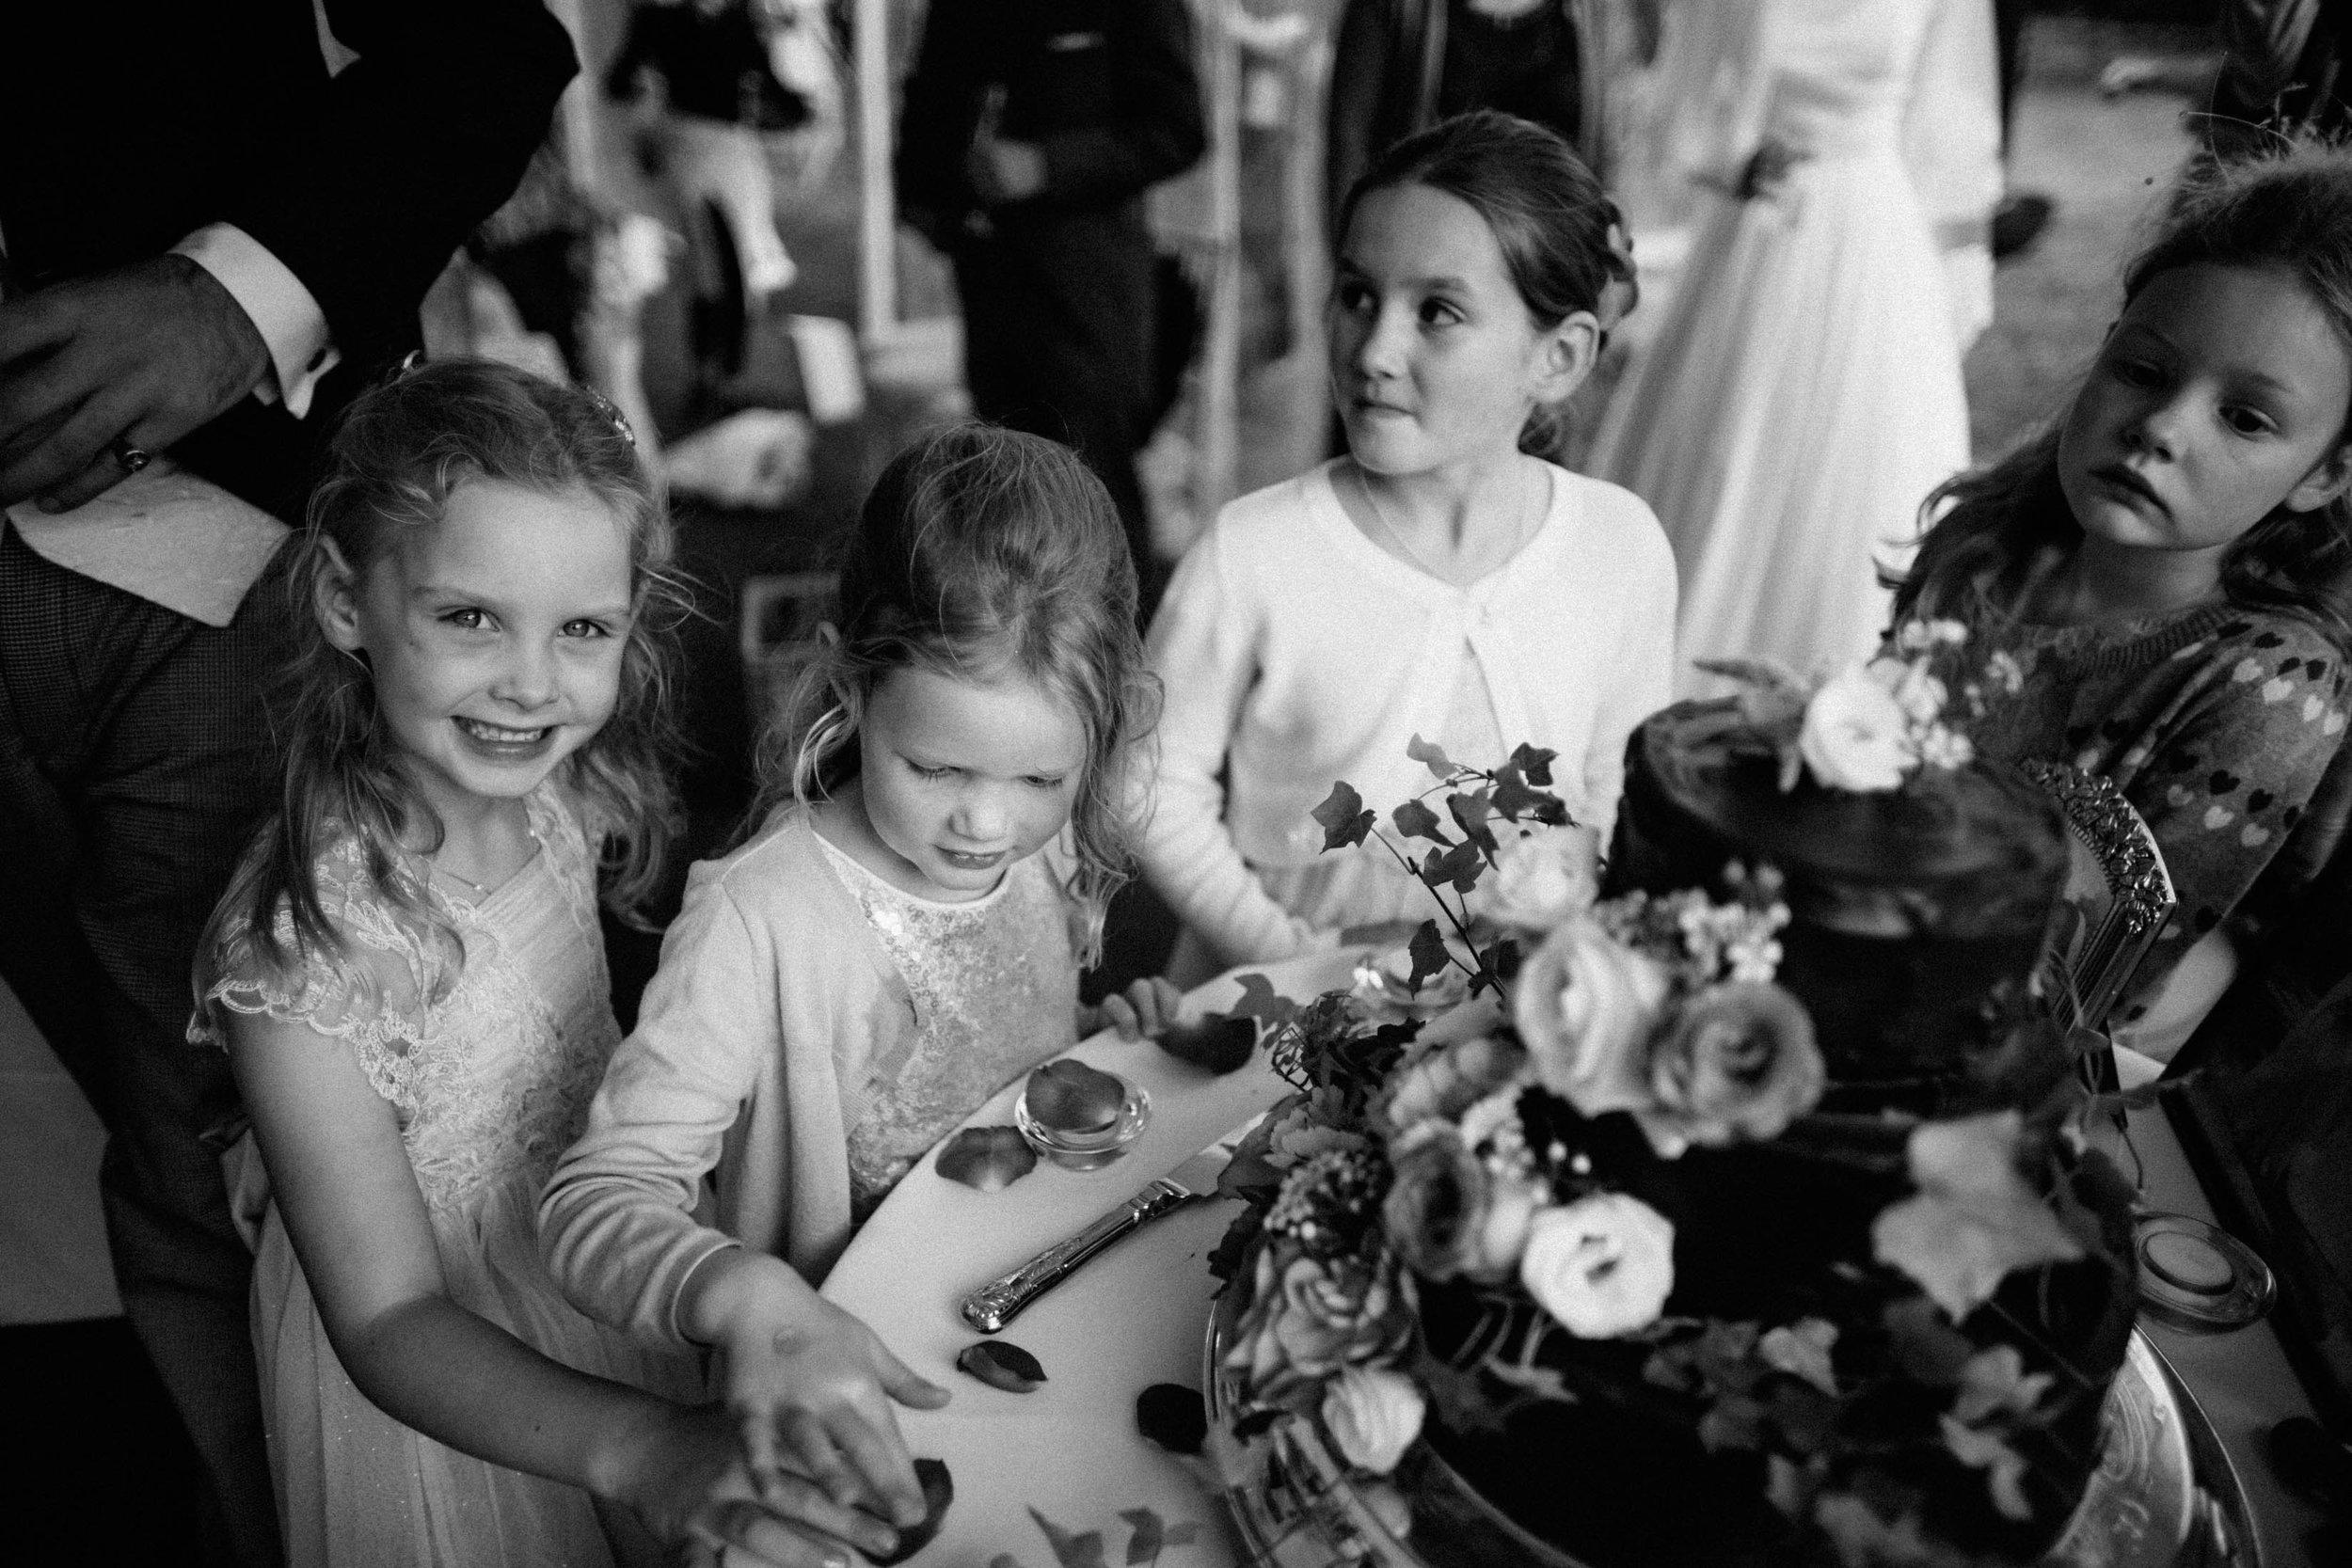 oxford_wedding_photographer-86.jpg